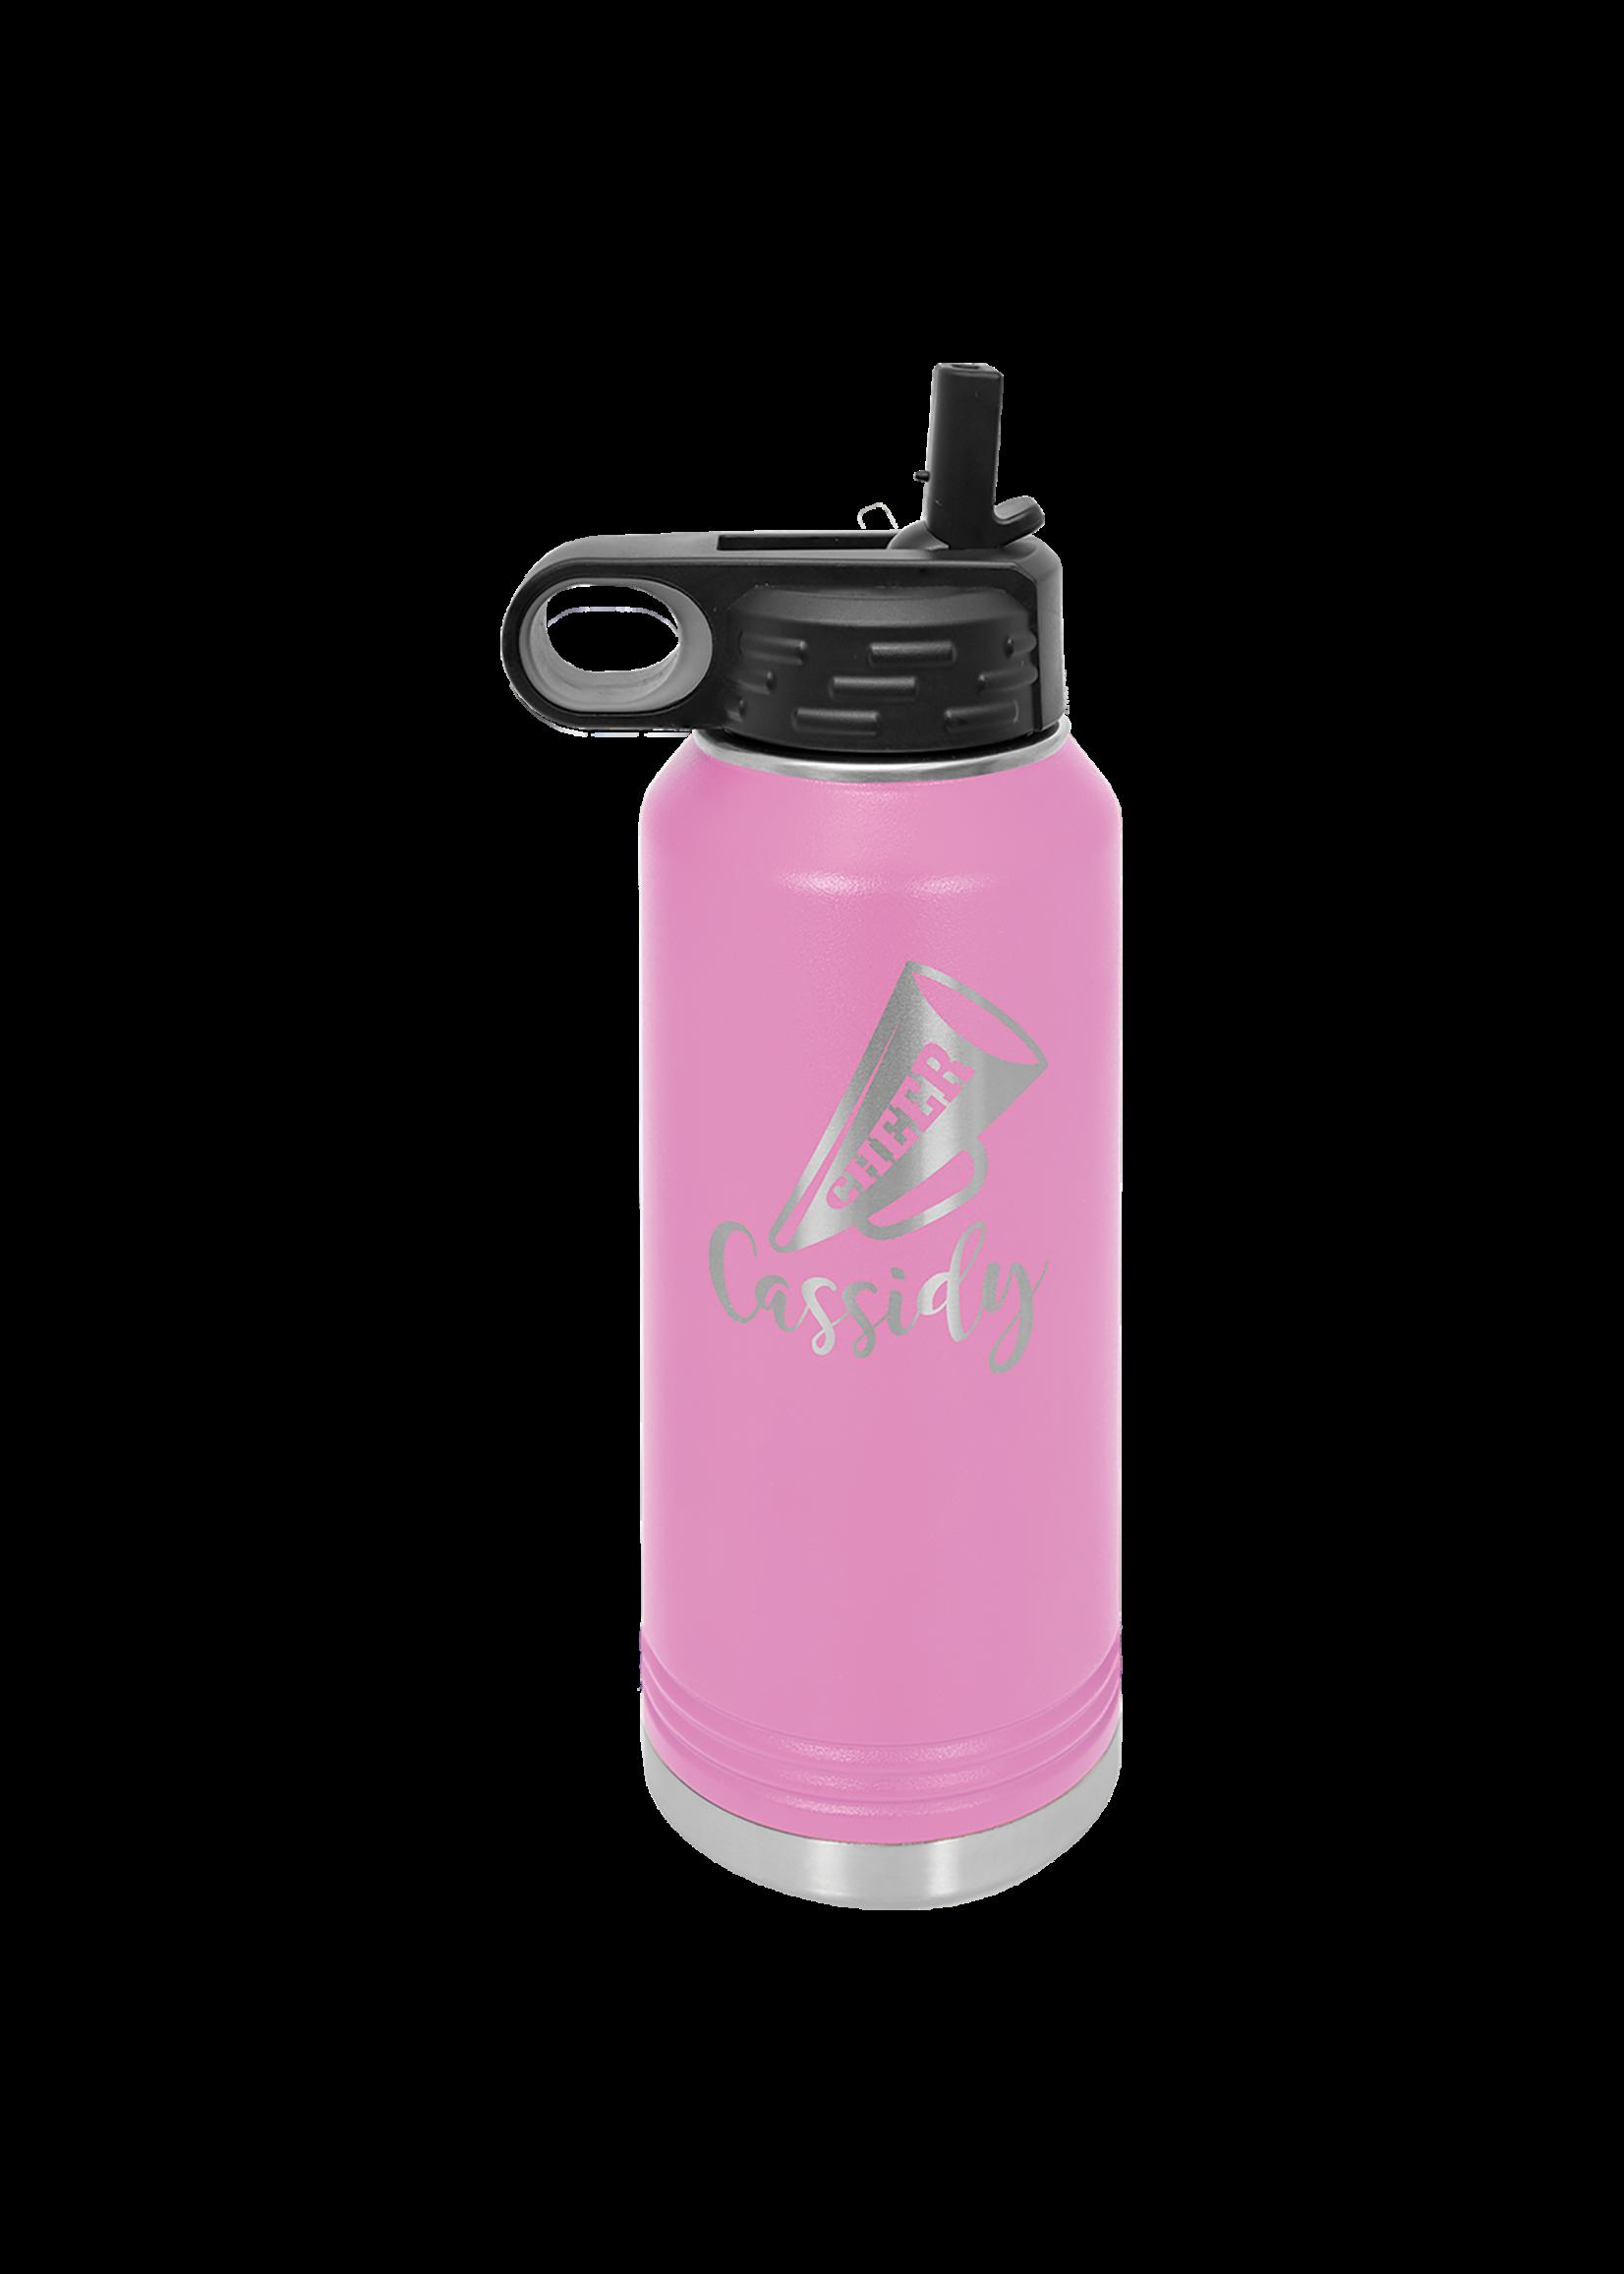 Polar Camel 32 oz Stainless Steel Water Bottle